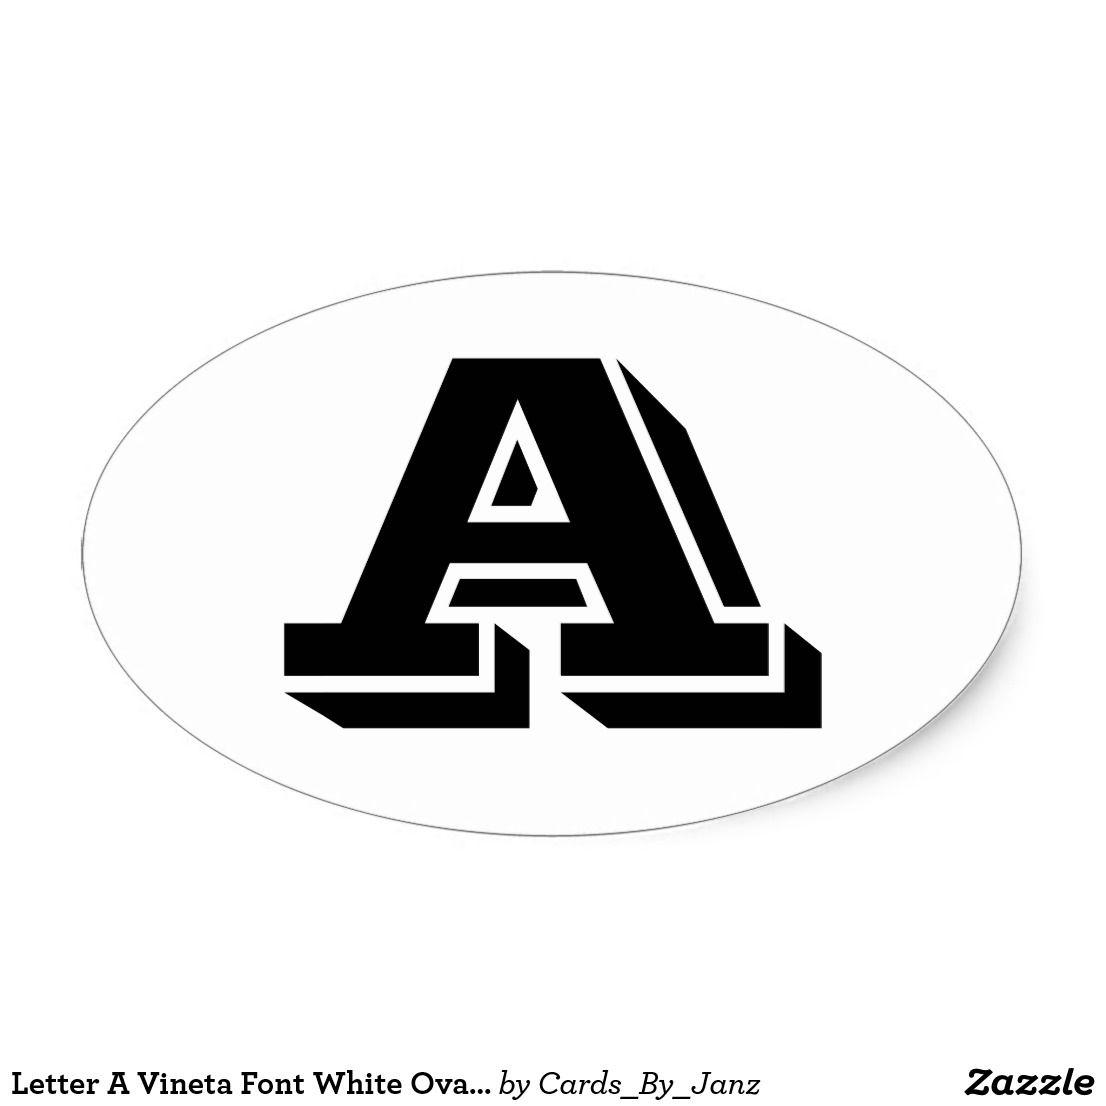 Letter A Vineta Font White Oval Stickers by Janz